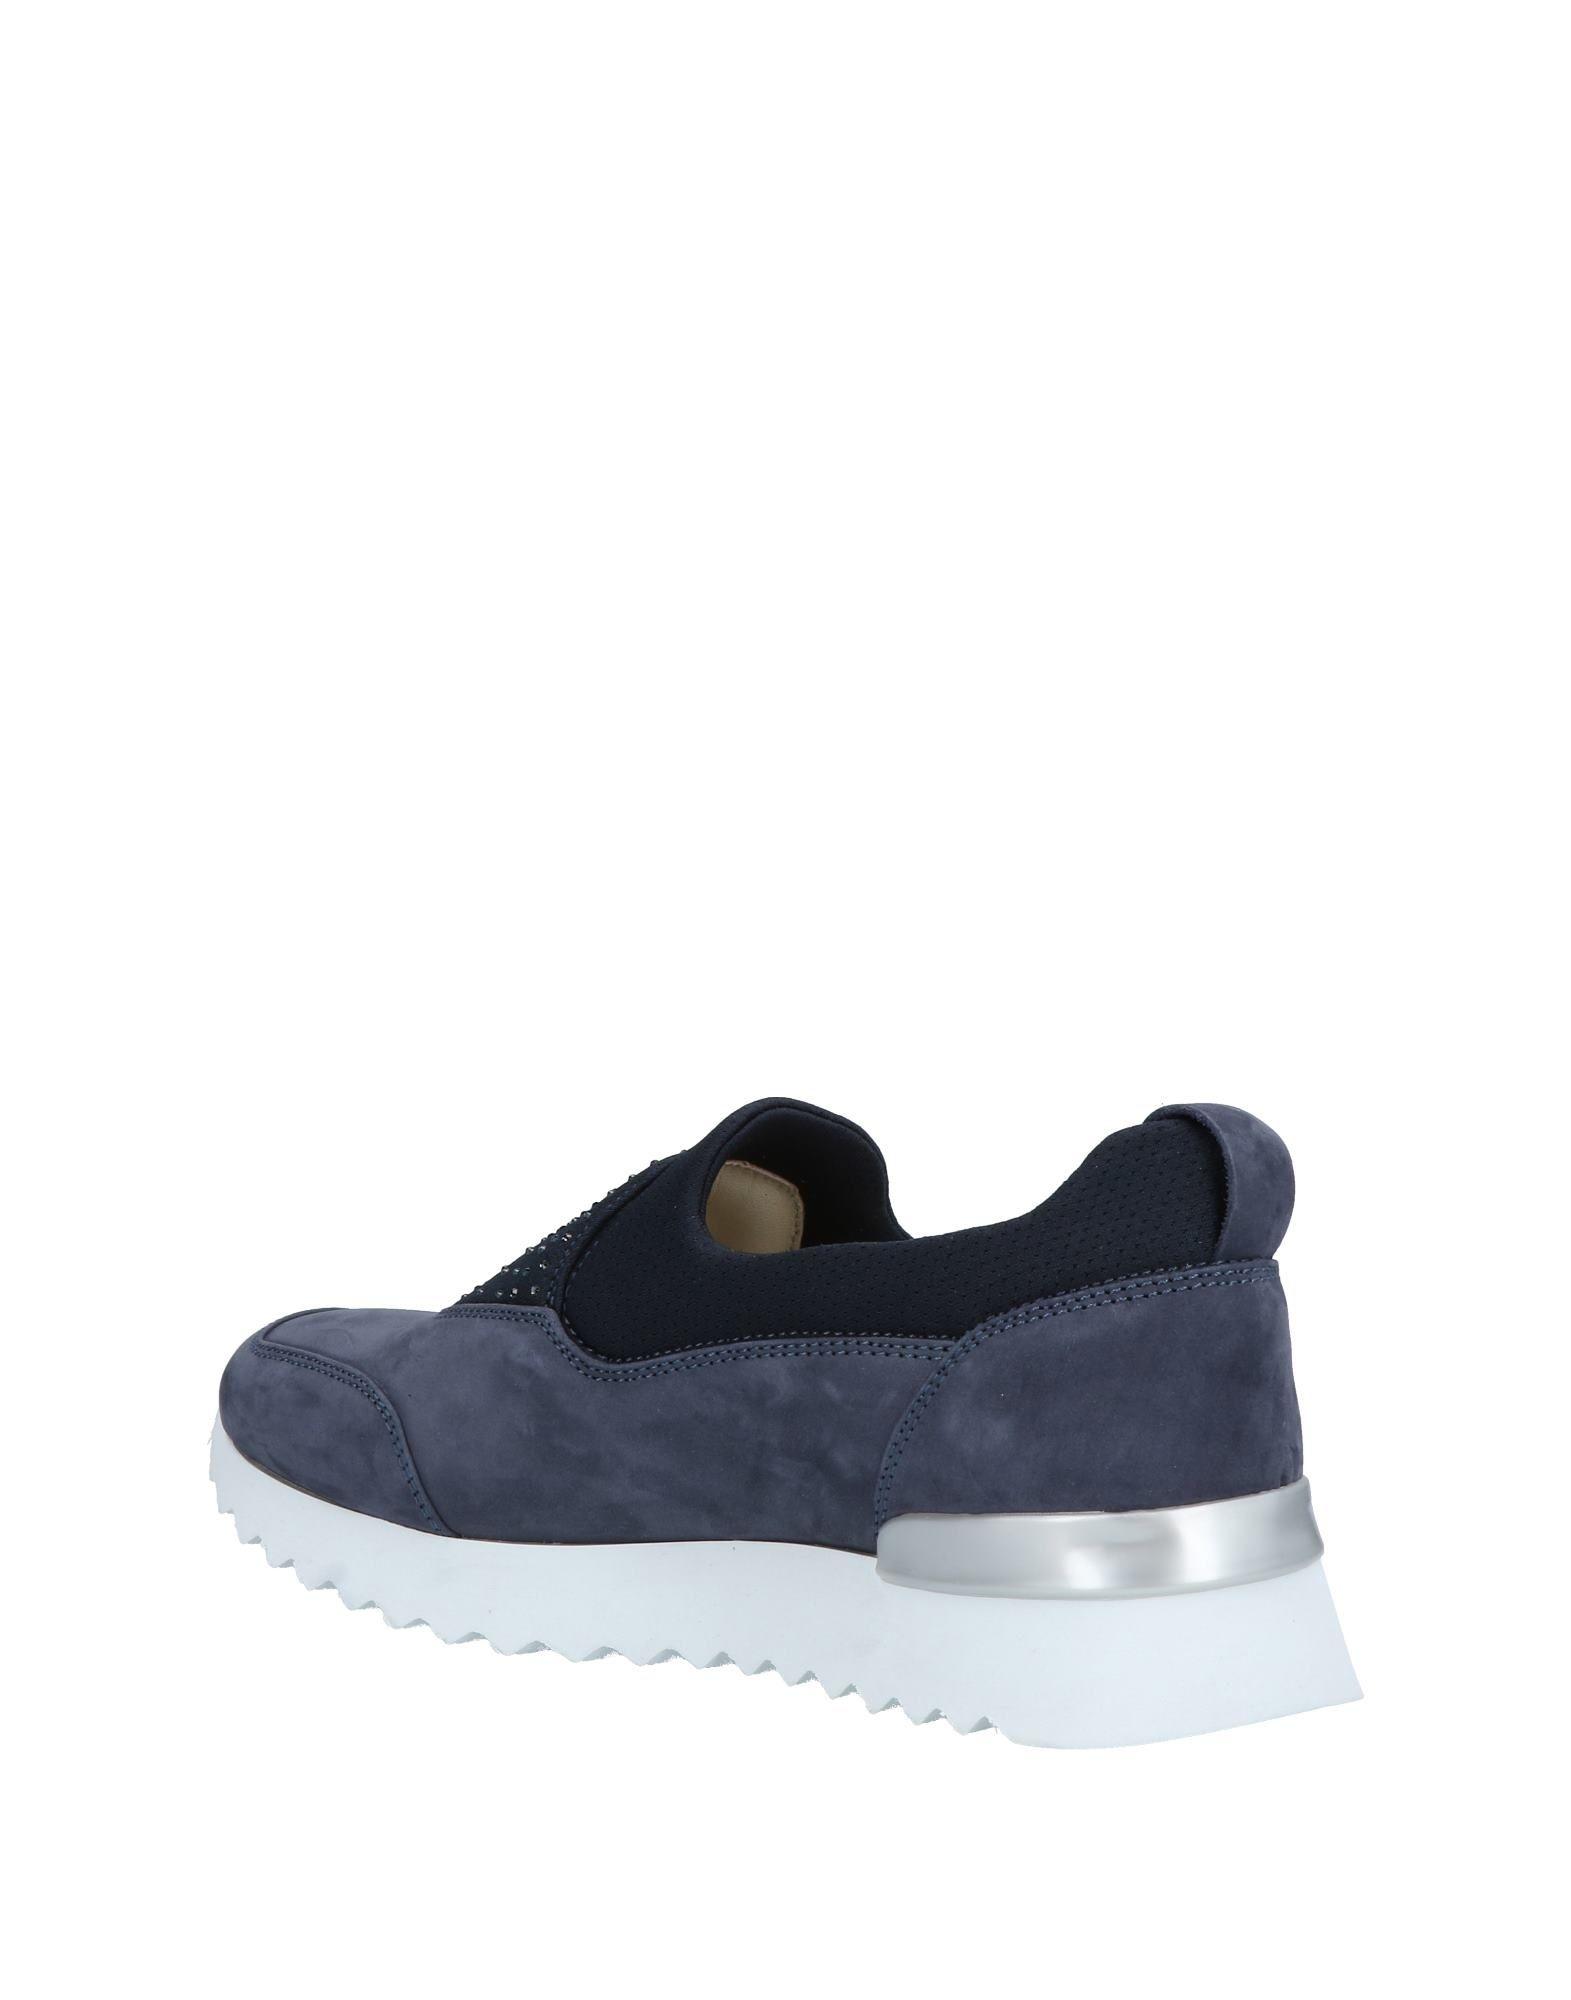 Gut um billige Schuhe zu tragenCesare tragenCesare tragenCesare P. Sneakers Damen  11455313OD 86bd83